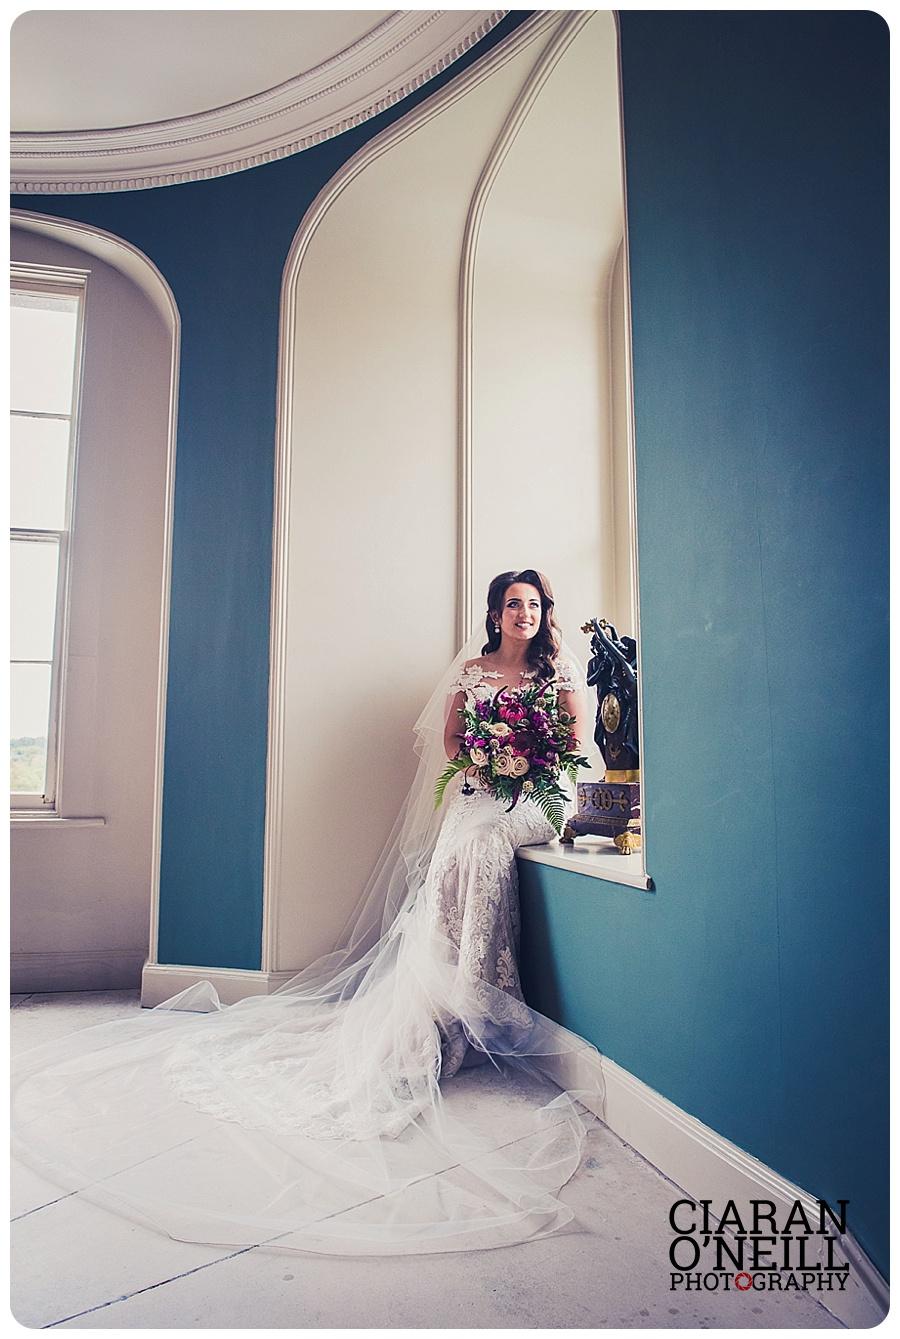 Siobhan & Kevin's wedding at Farnham Estate by Ciaran O'Neill Photography